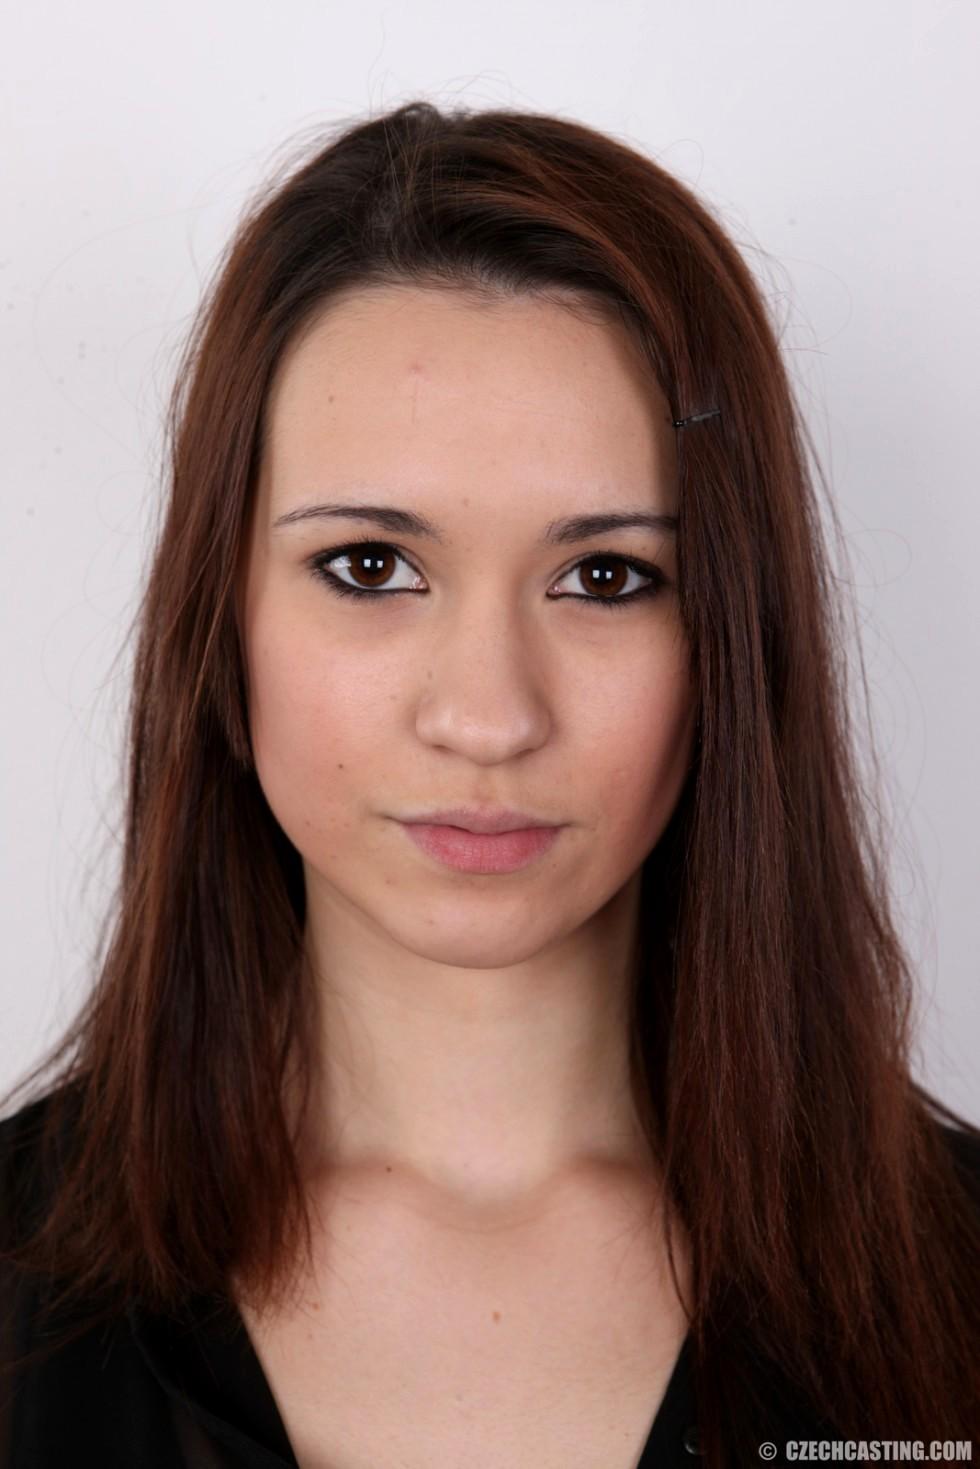 Czech Casting Czechcasting Model Enjoy Hot Imgur Sex HD Pics